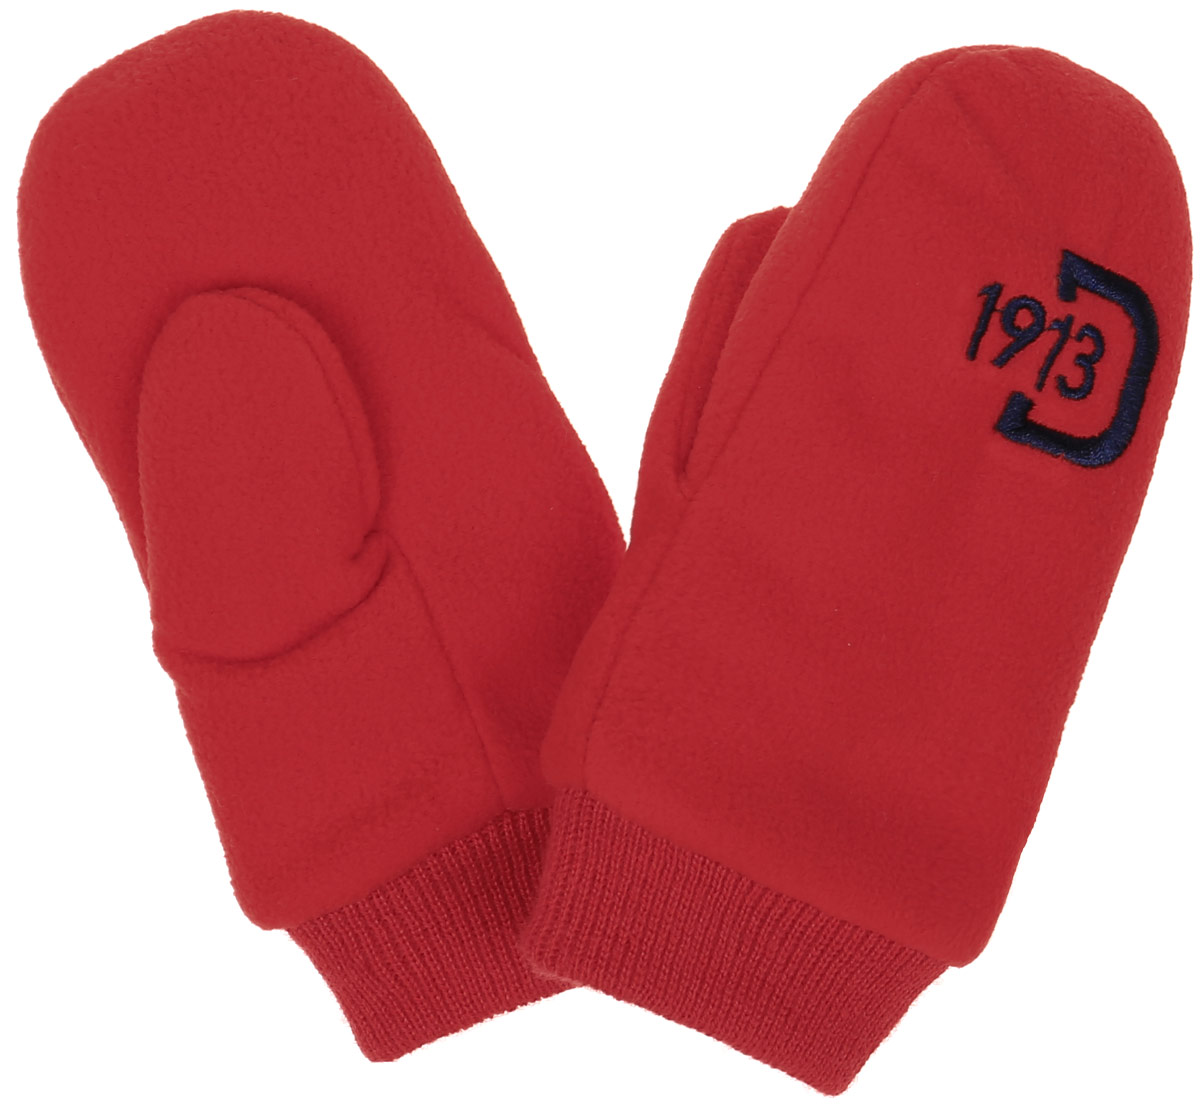 Варежки детские Didriksons1913 Kids Microfleece Gloves, цвет: красный. 501144_042. Размер 0 месяцев варежки bonus gloves варежки bonus gloves